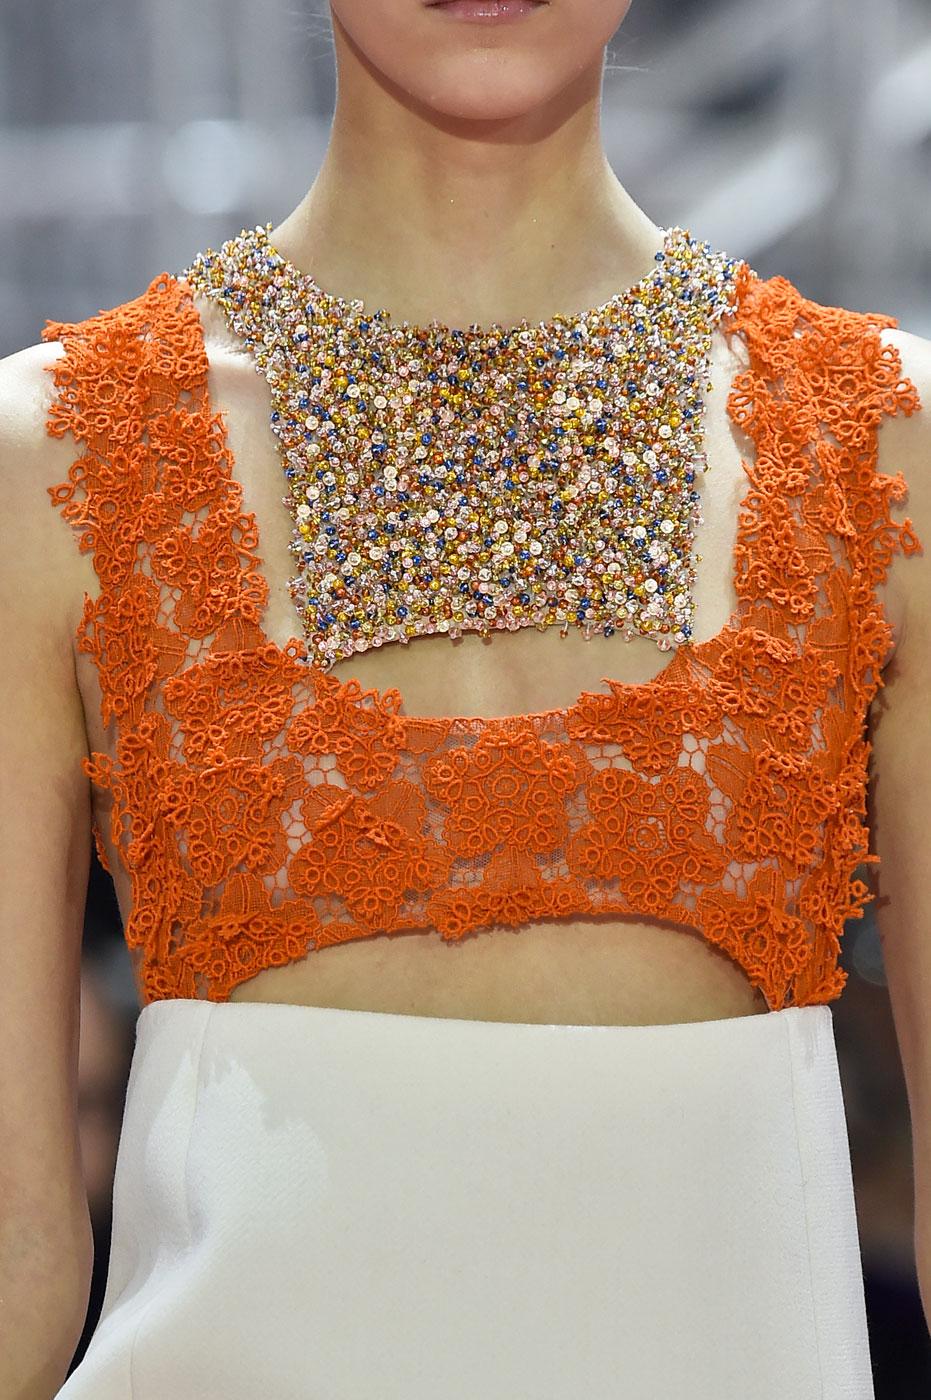 Christian-Dior-fashion-runway-show-close-ups-haute-couture-paris-spring-summer-2015-the-impression-063